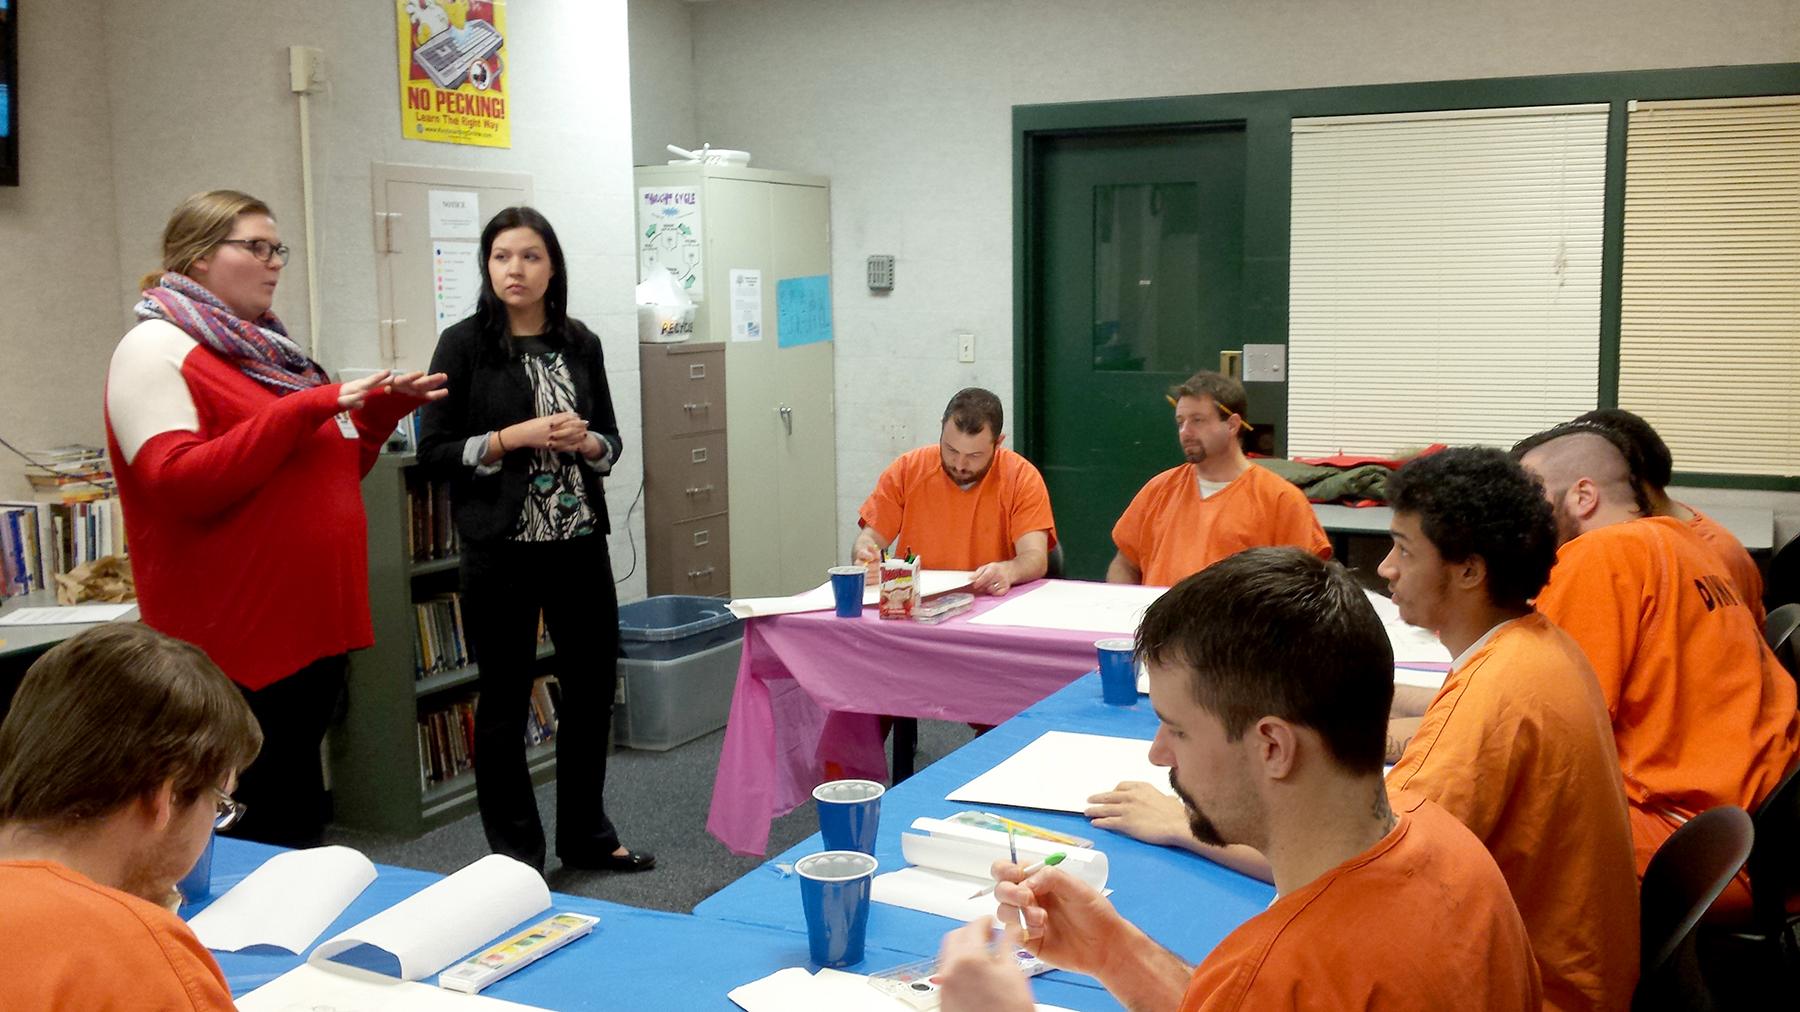 Sierra Thomfohrda  UW-Stout Art Education INTERNSHIP: Art Therapy, Dunn County Jail